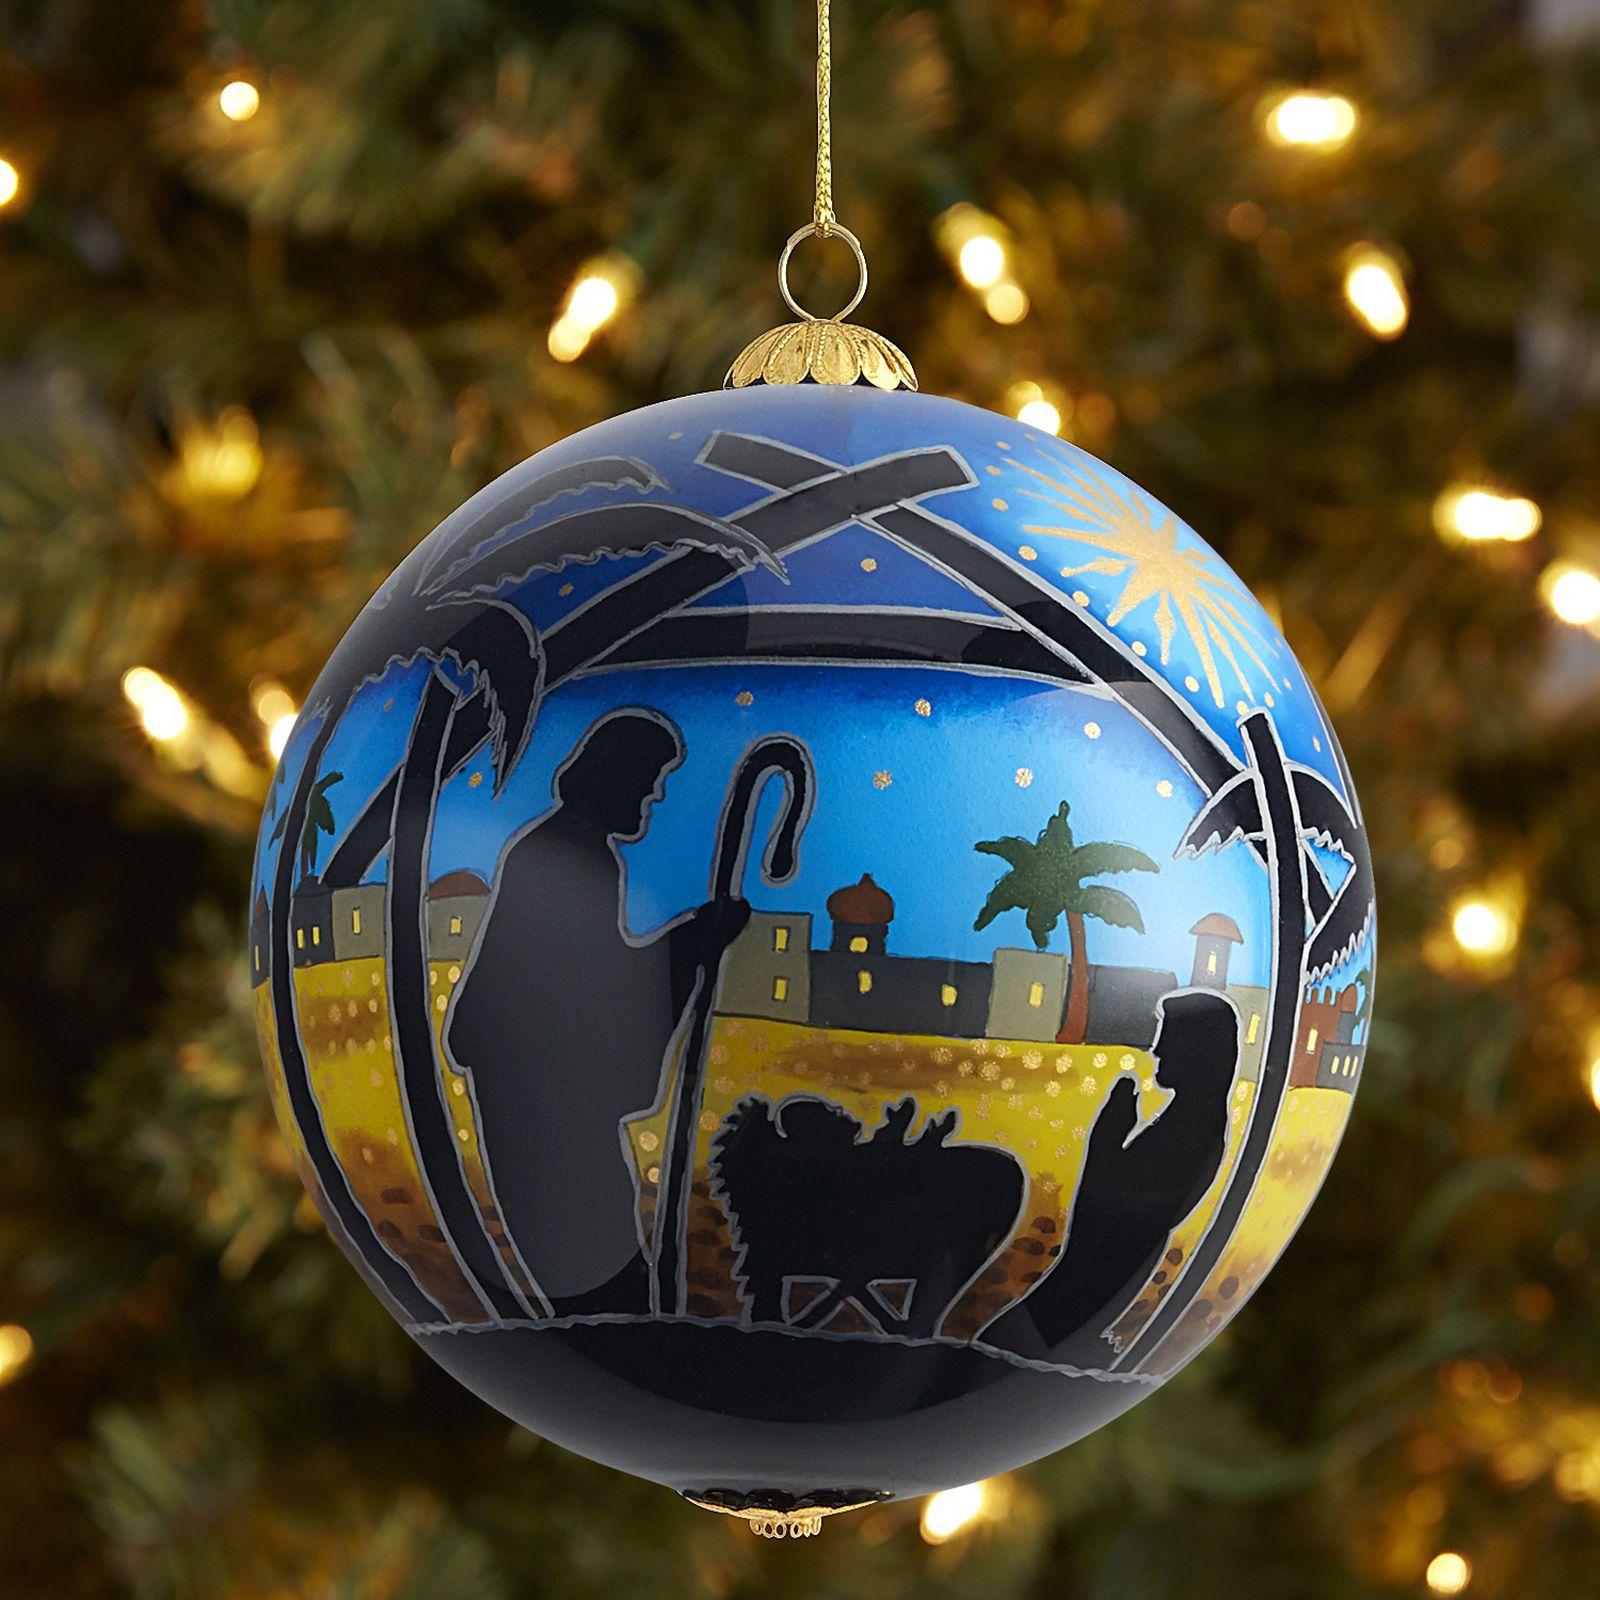 Li Bien Nativity Scene Ornament Christmas Ornaments Ornaments Nativity